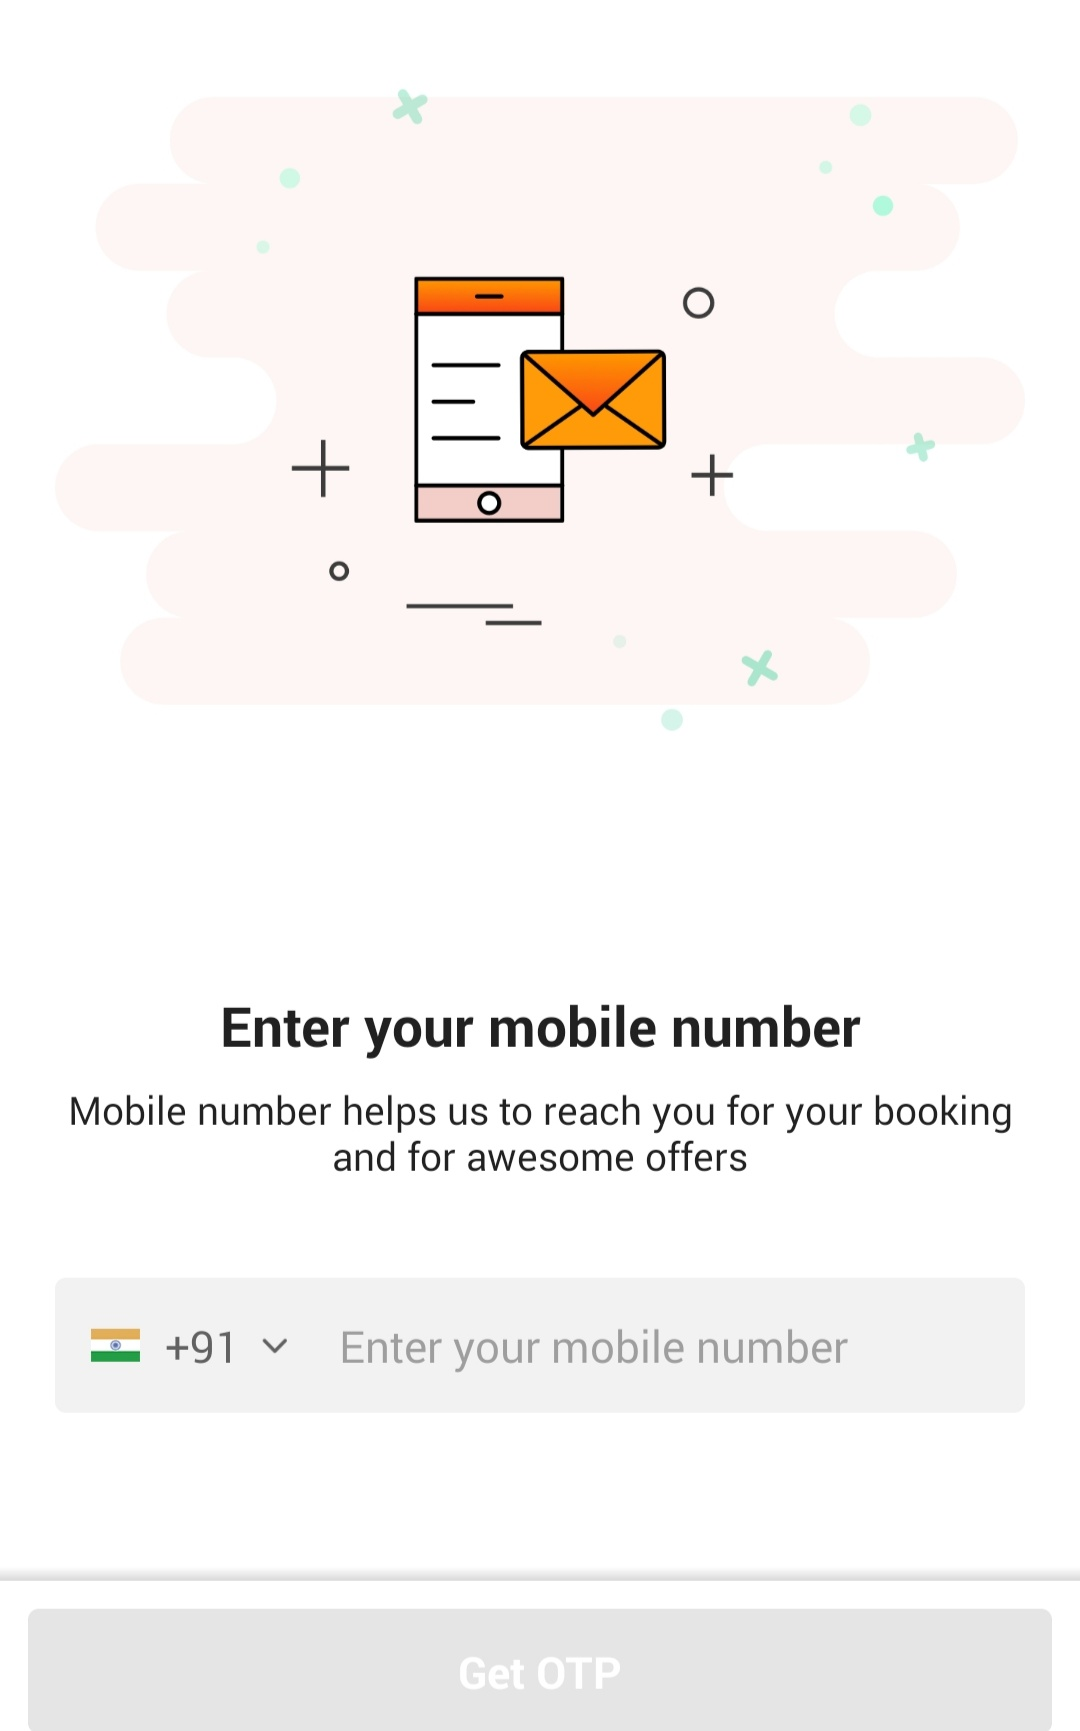 EazyDiner-App-Register